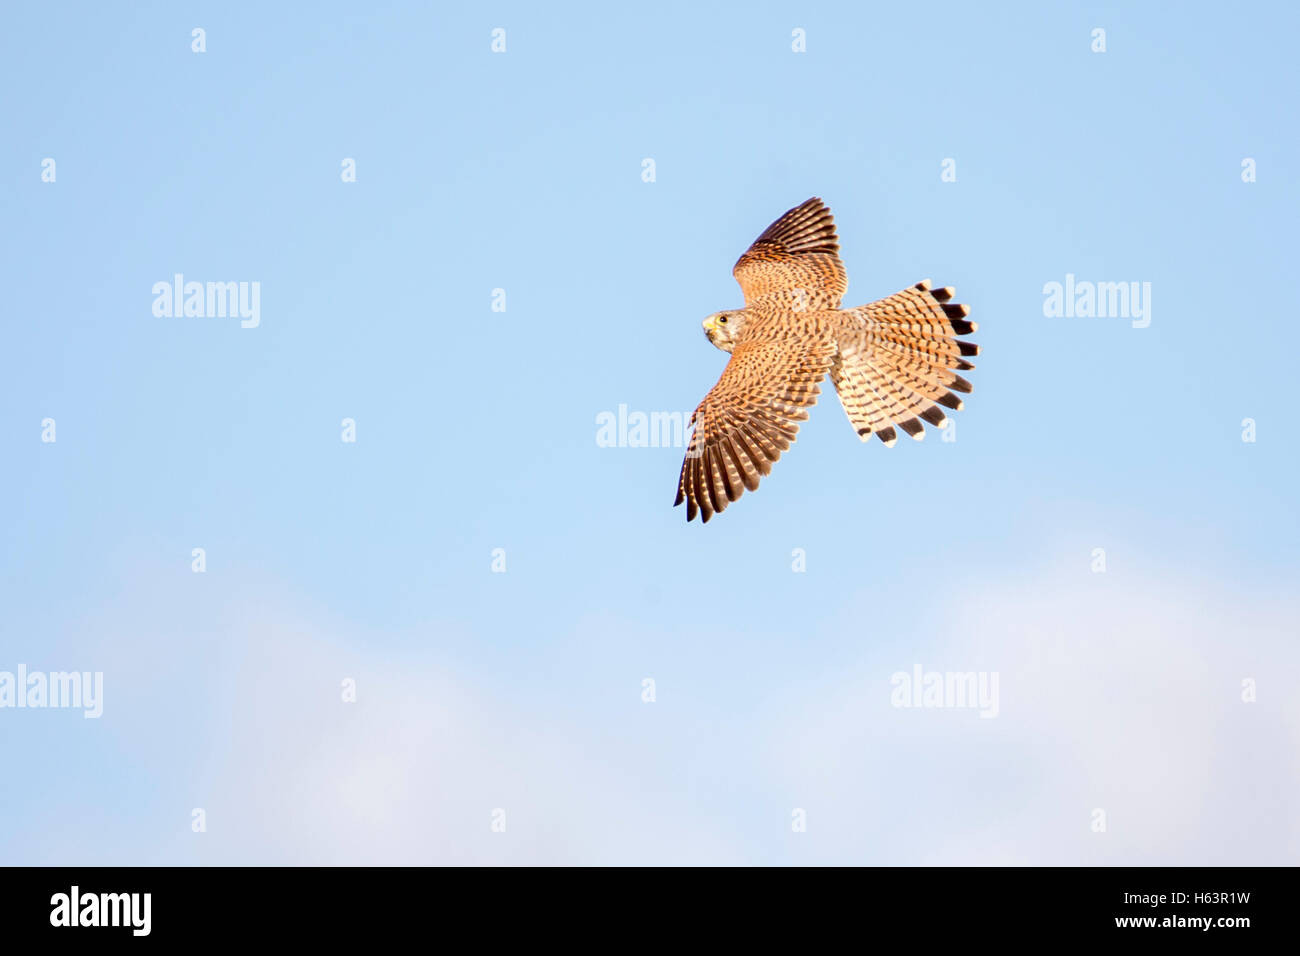 common kestrel Falco tinnunculus Laikipia Kenya Africa flying and turning - Stock Image